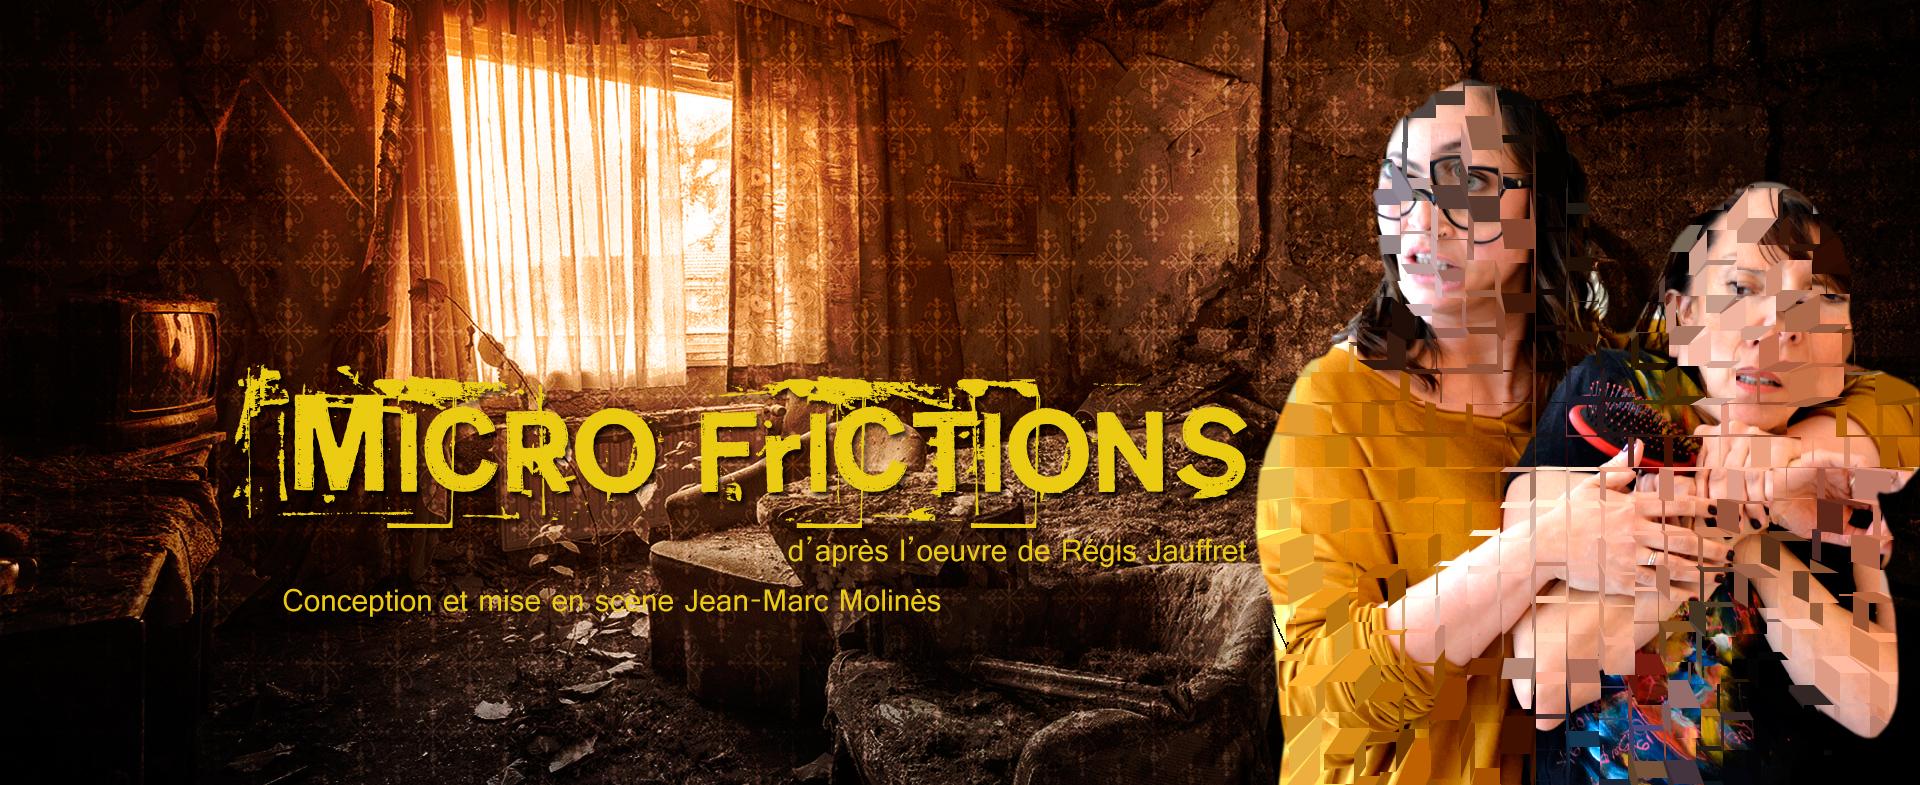 MICRO F(r)ICTIONS